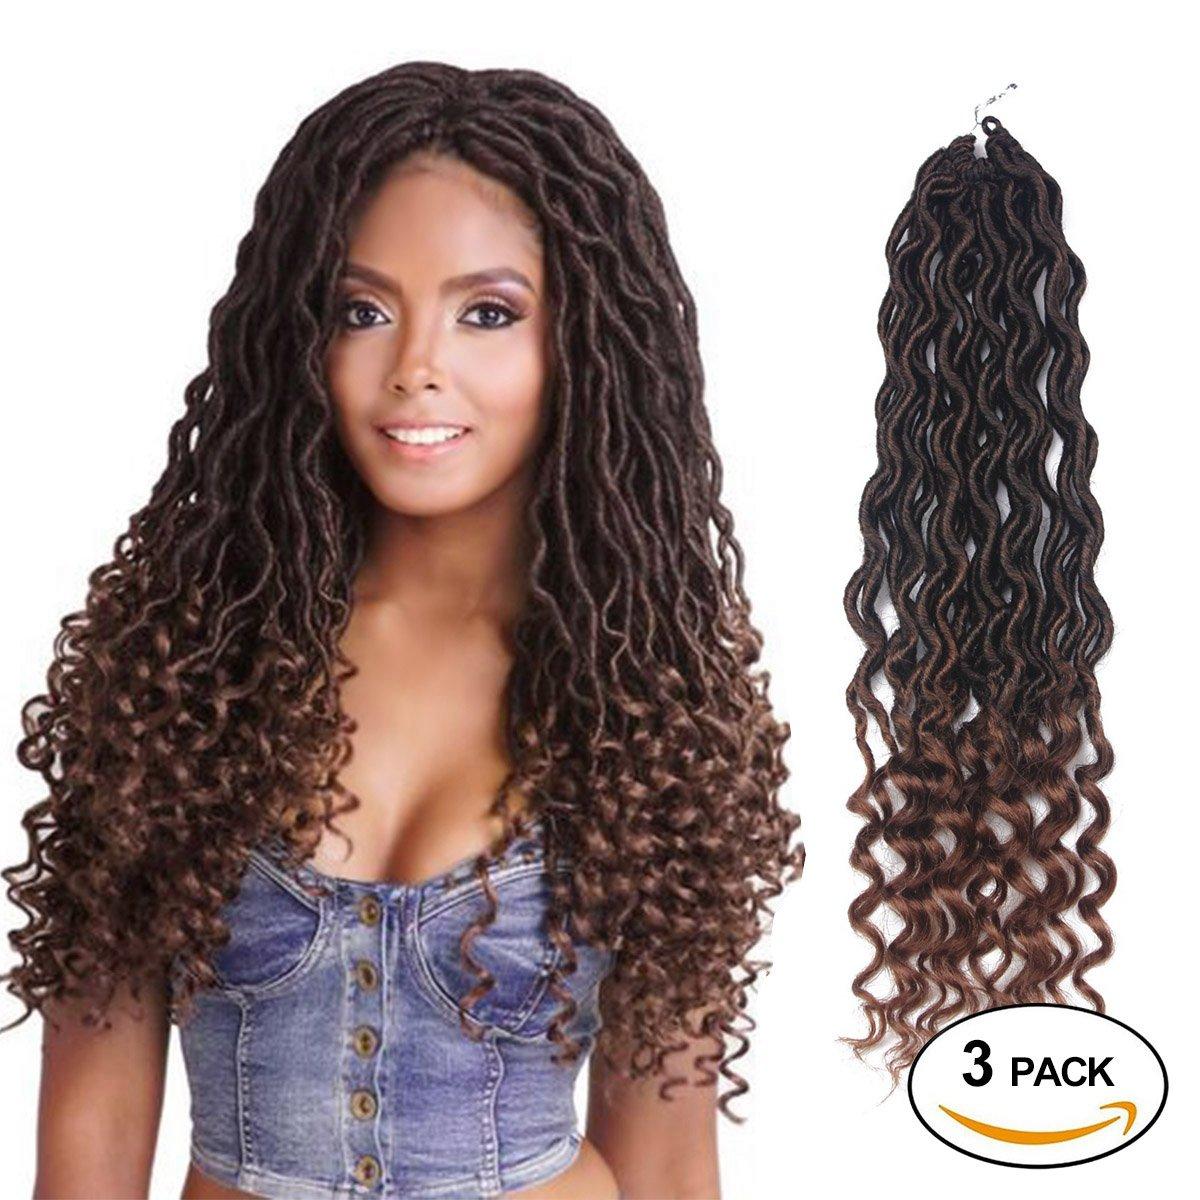 Amazon Com African Hair Braiding Goddess Faux Locs Crochet Hair Braids Wavy With Curly Ends African American Hair Extensions Dark Brown Soft Dread Dreadlocks 3packs Lot 1b 30 Beauty